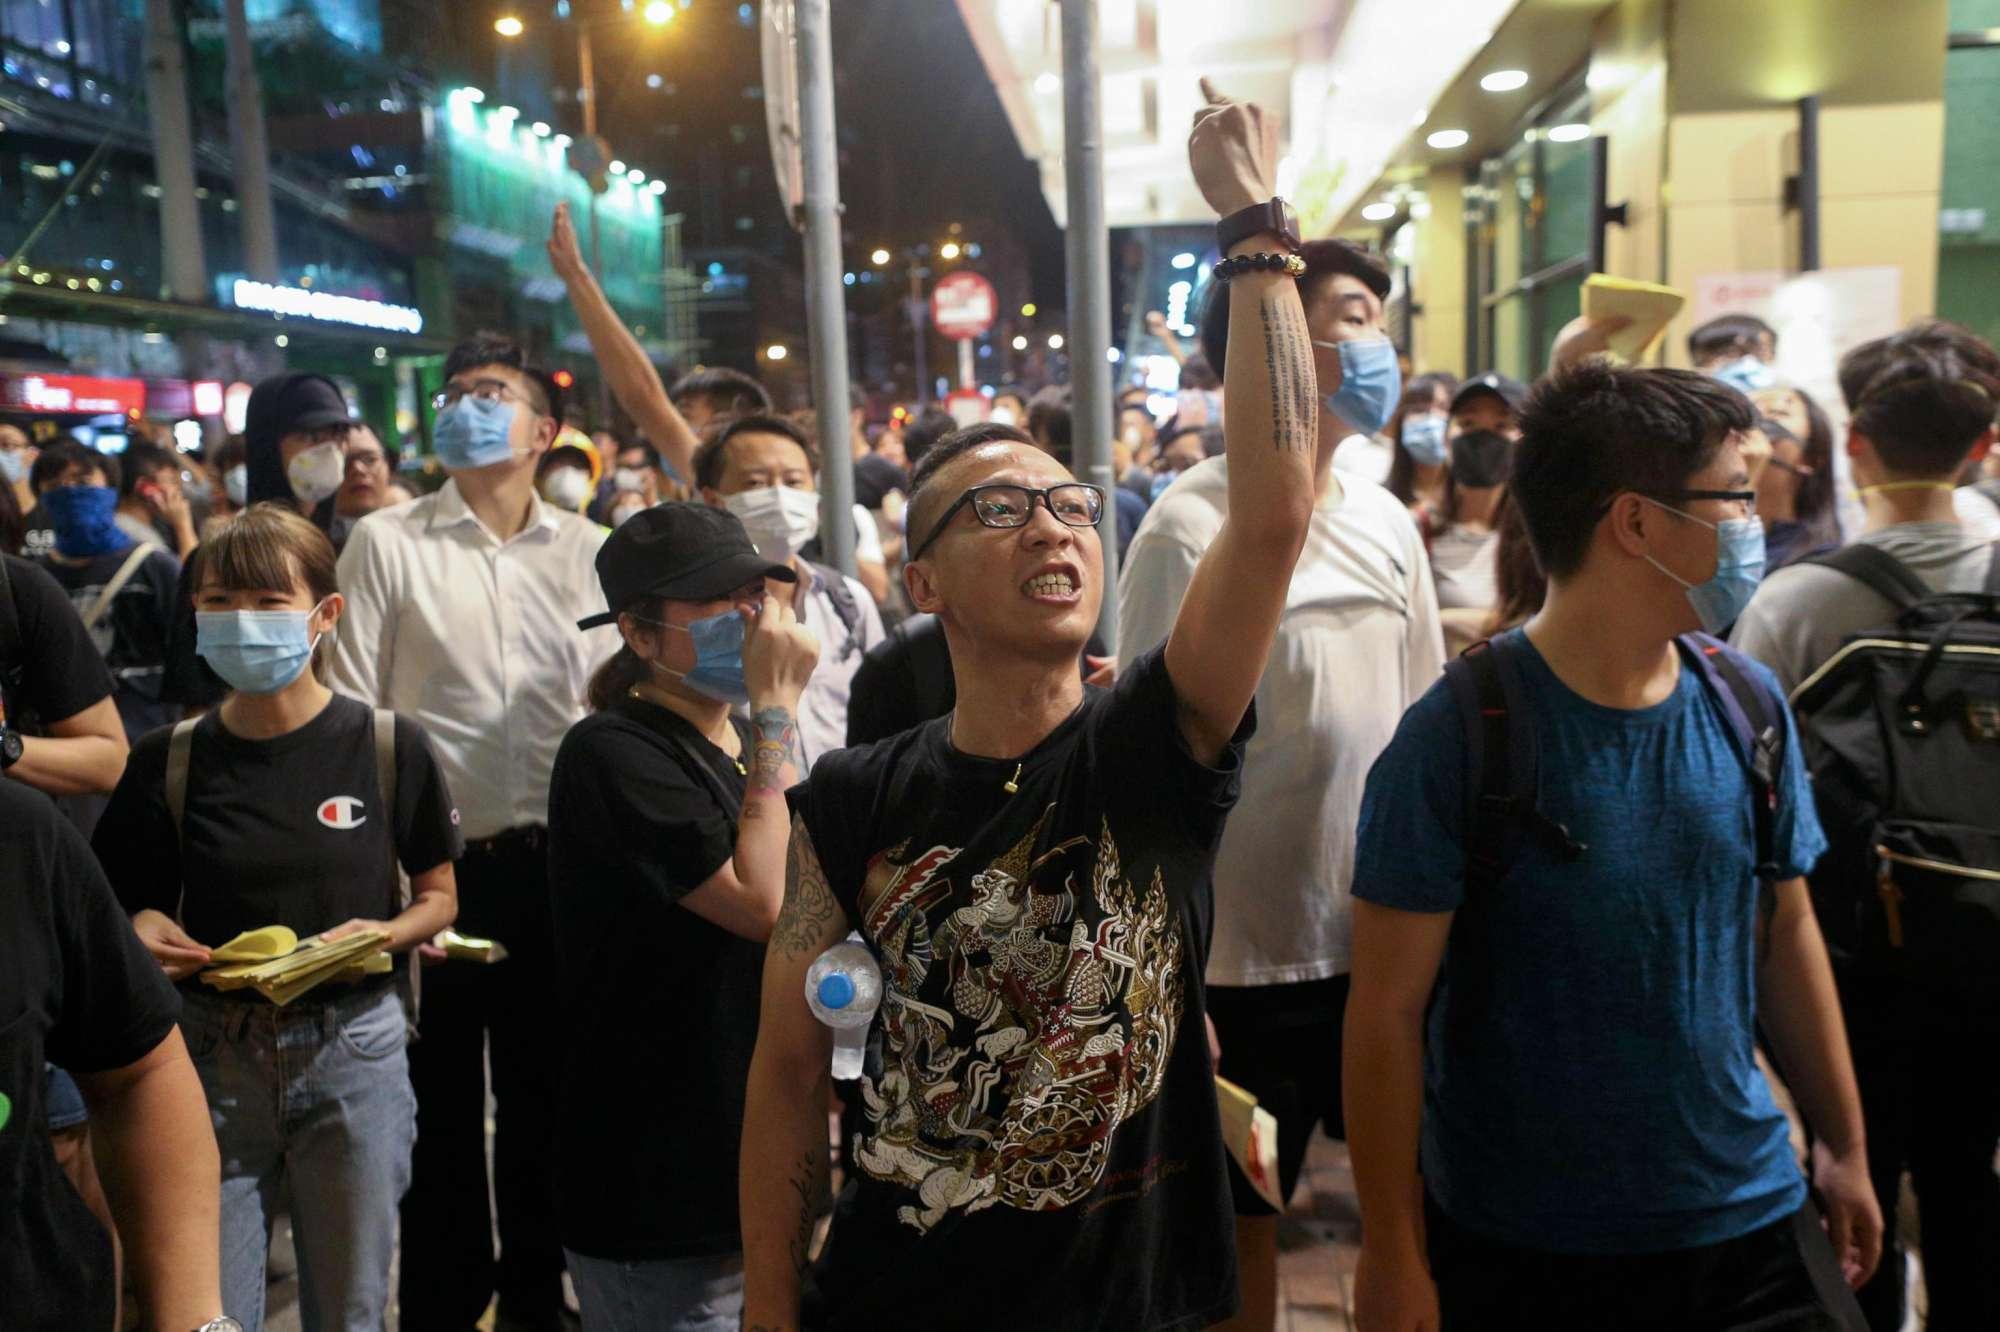 Ancora proteste a Hong Kong, la polizia spara lacrimogeni